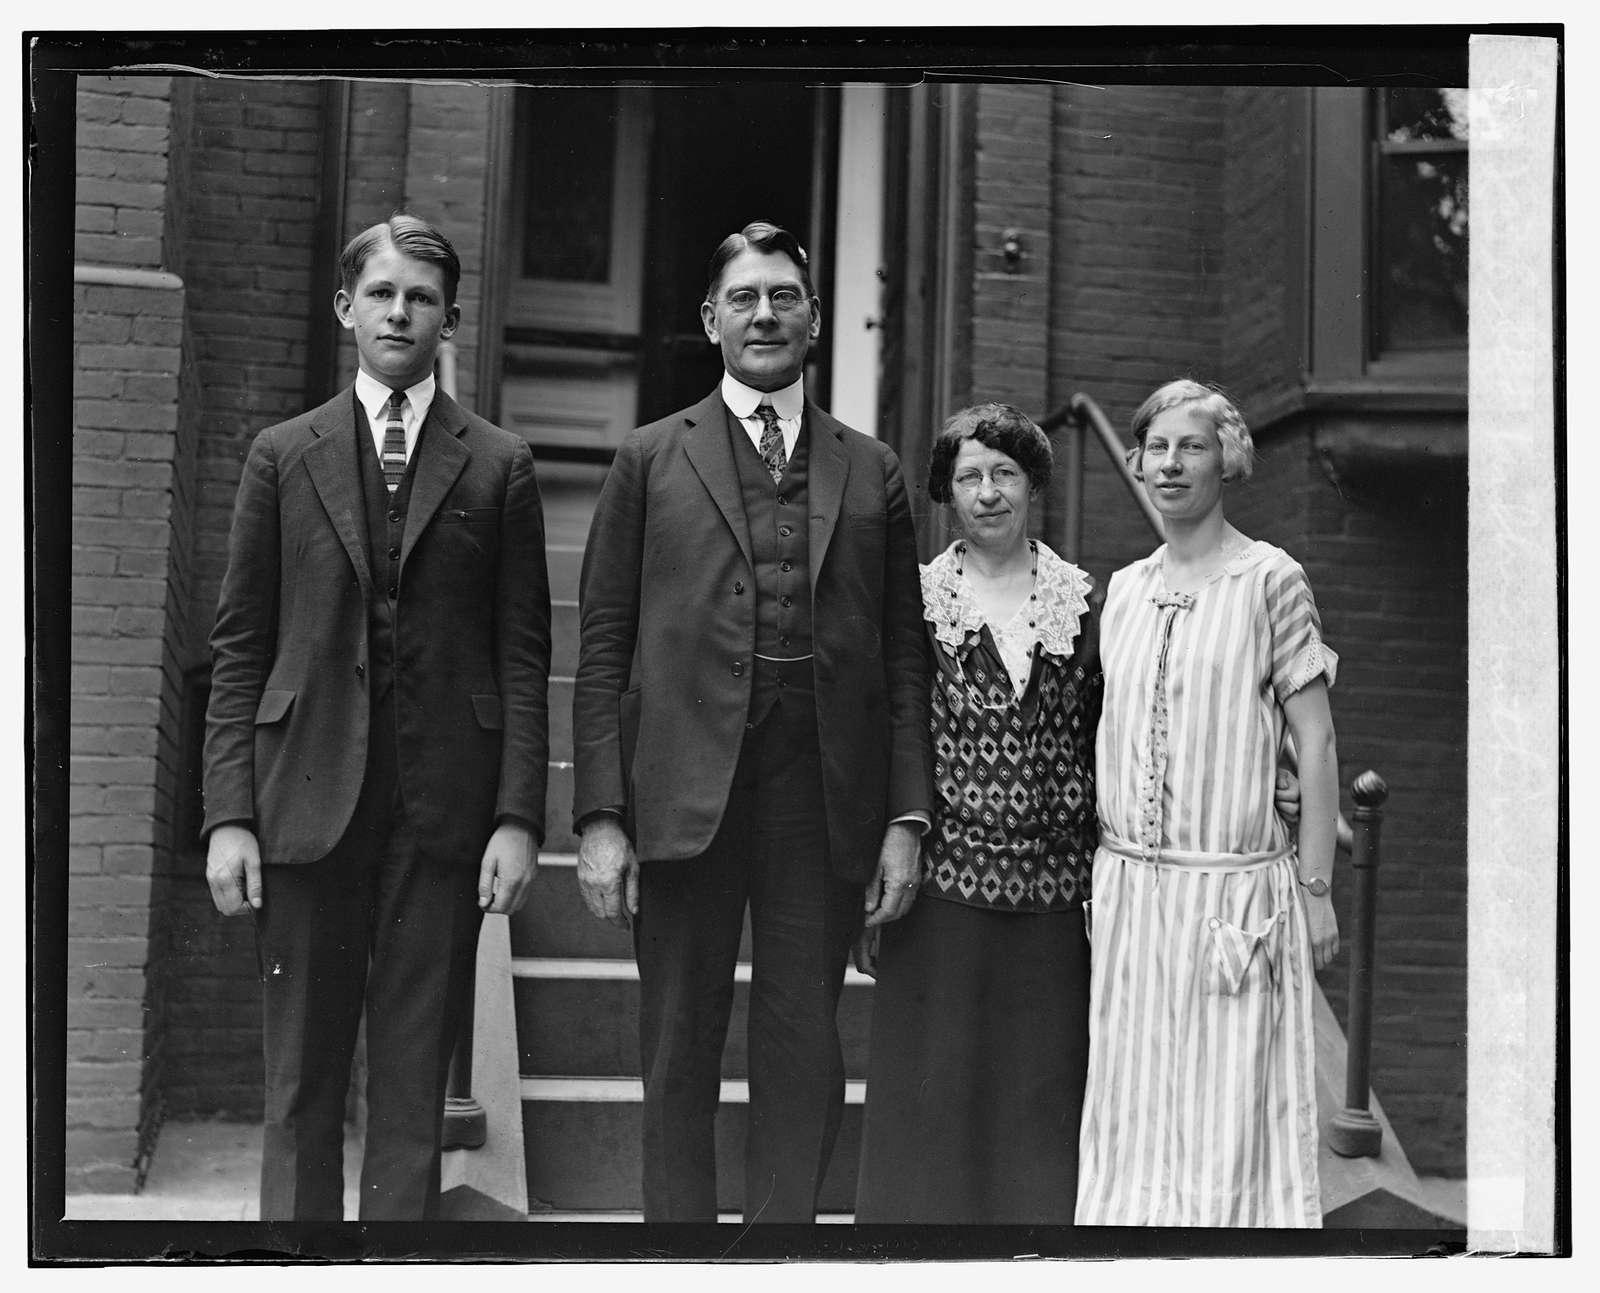 Sec. Wilbur with wife & 2 children, 6324